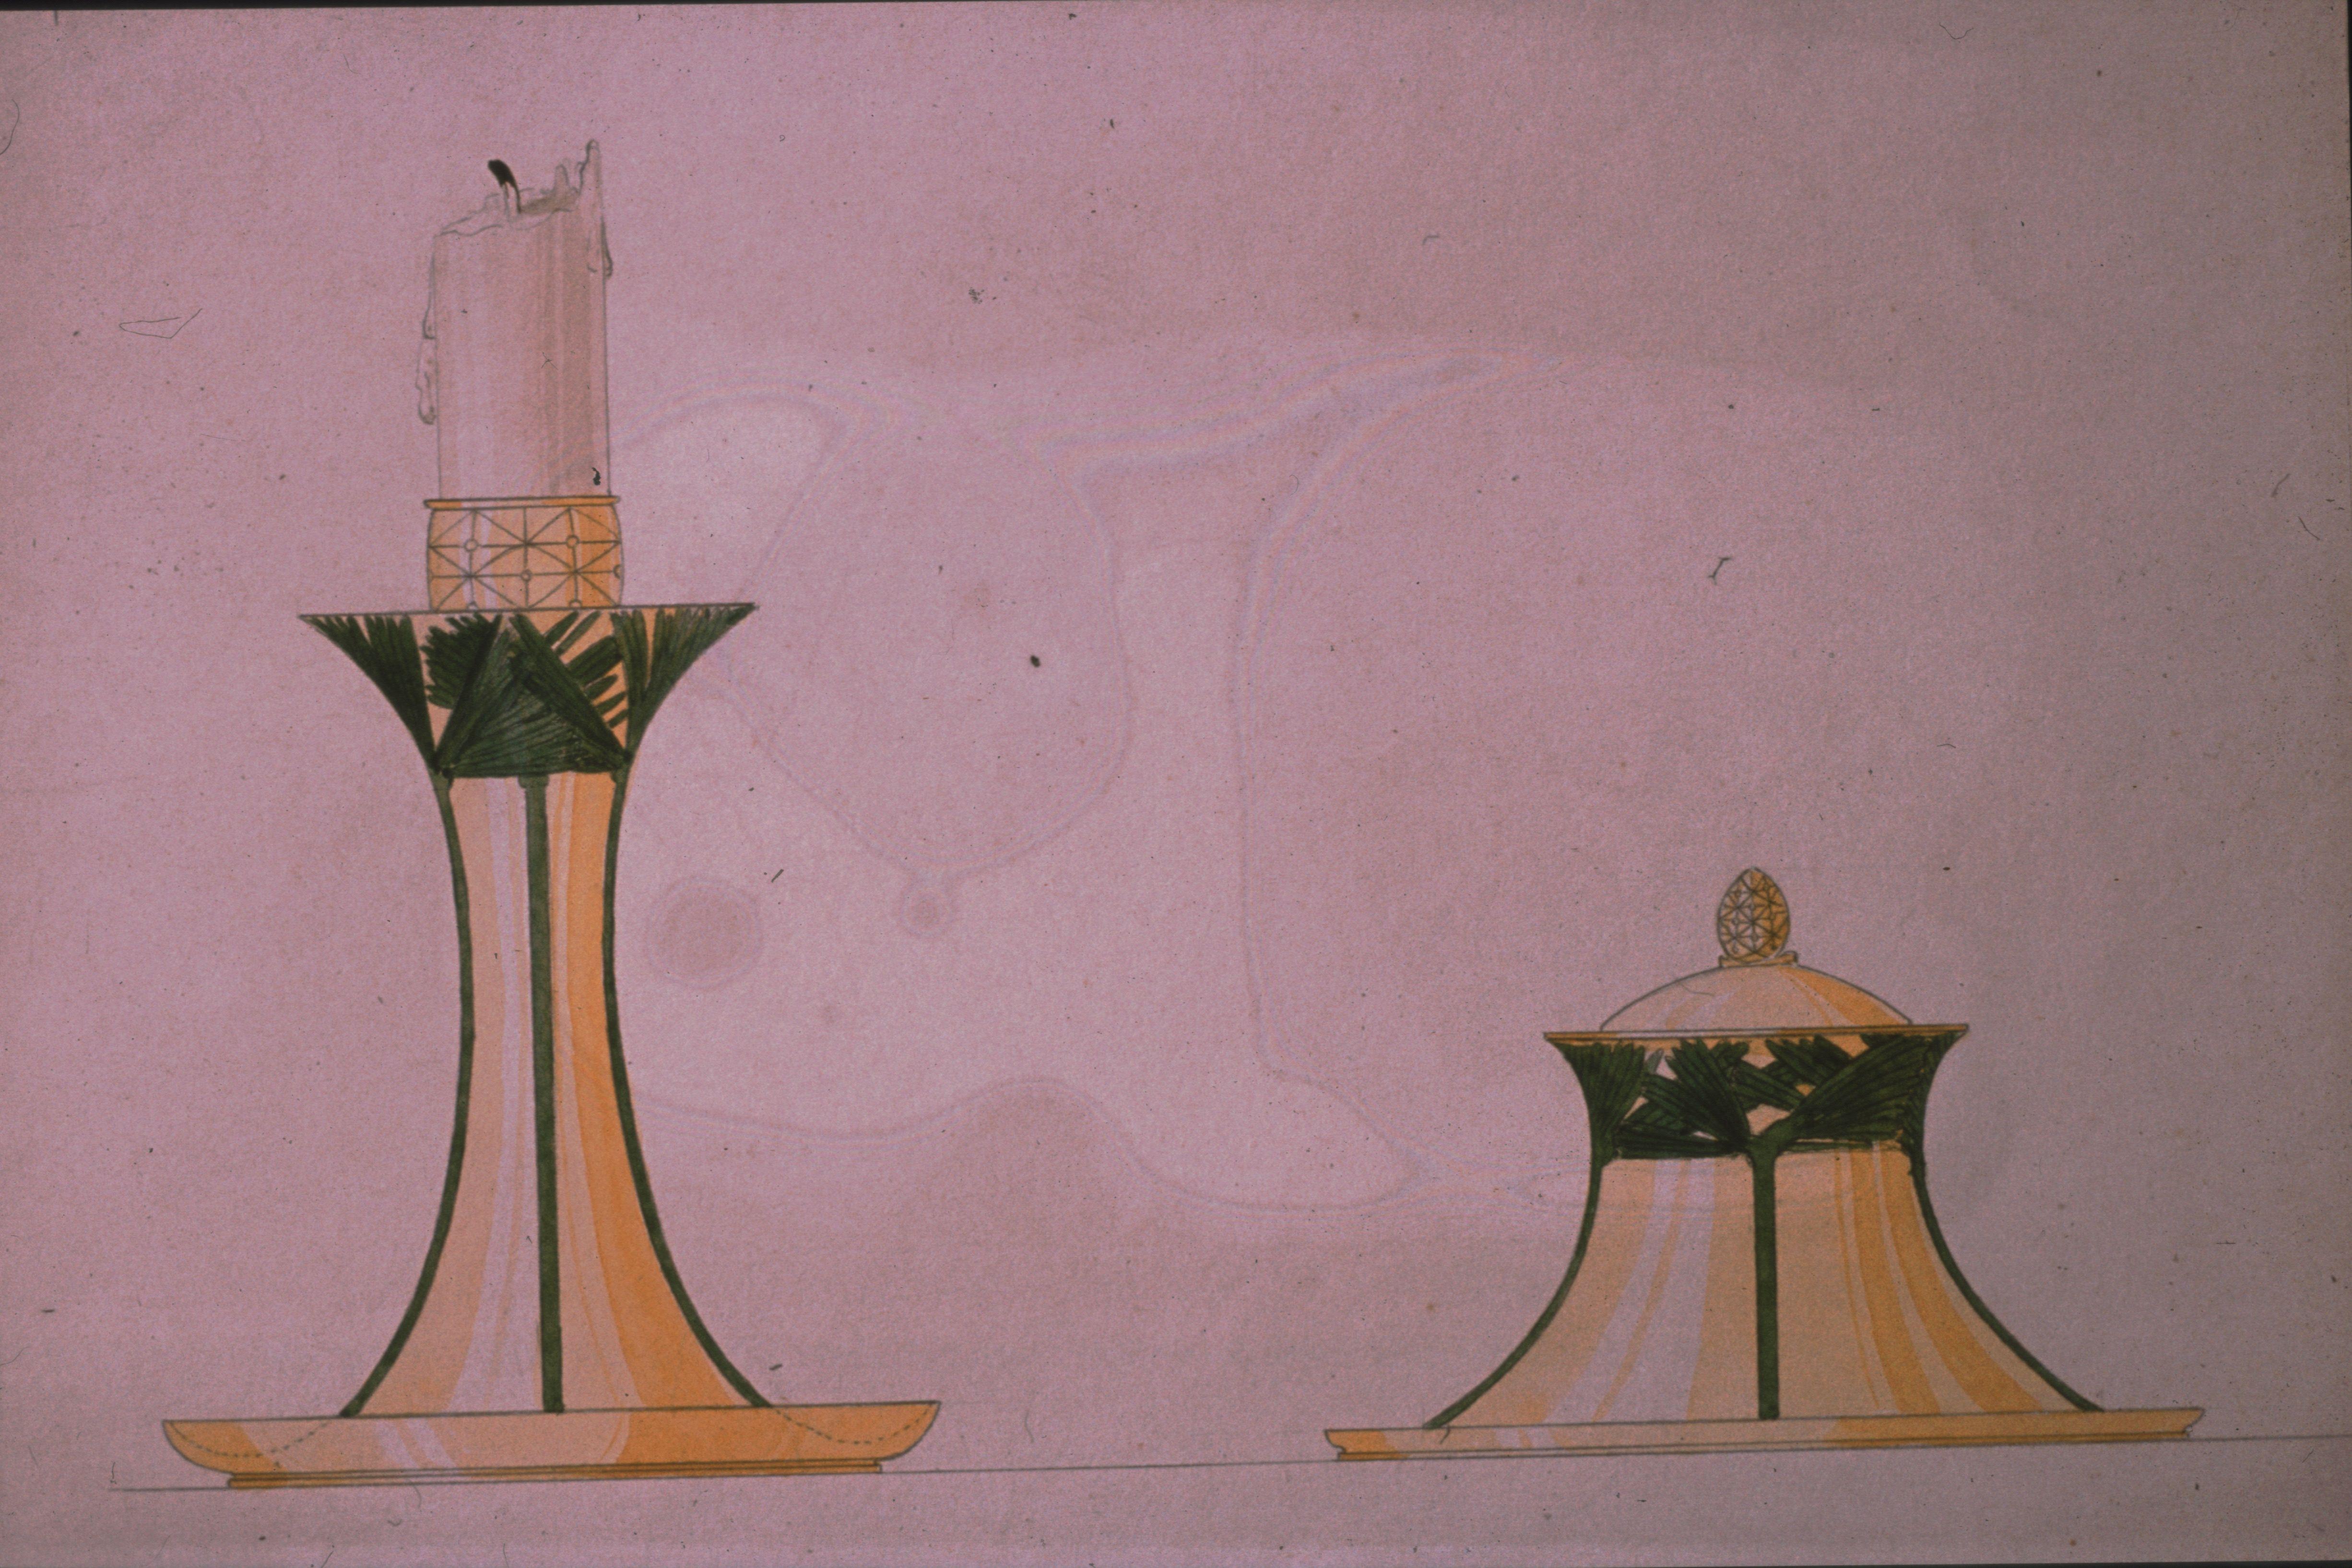 Gustav Gaudernack. Design of candlestick holder and inkwell. Silver and enamel